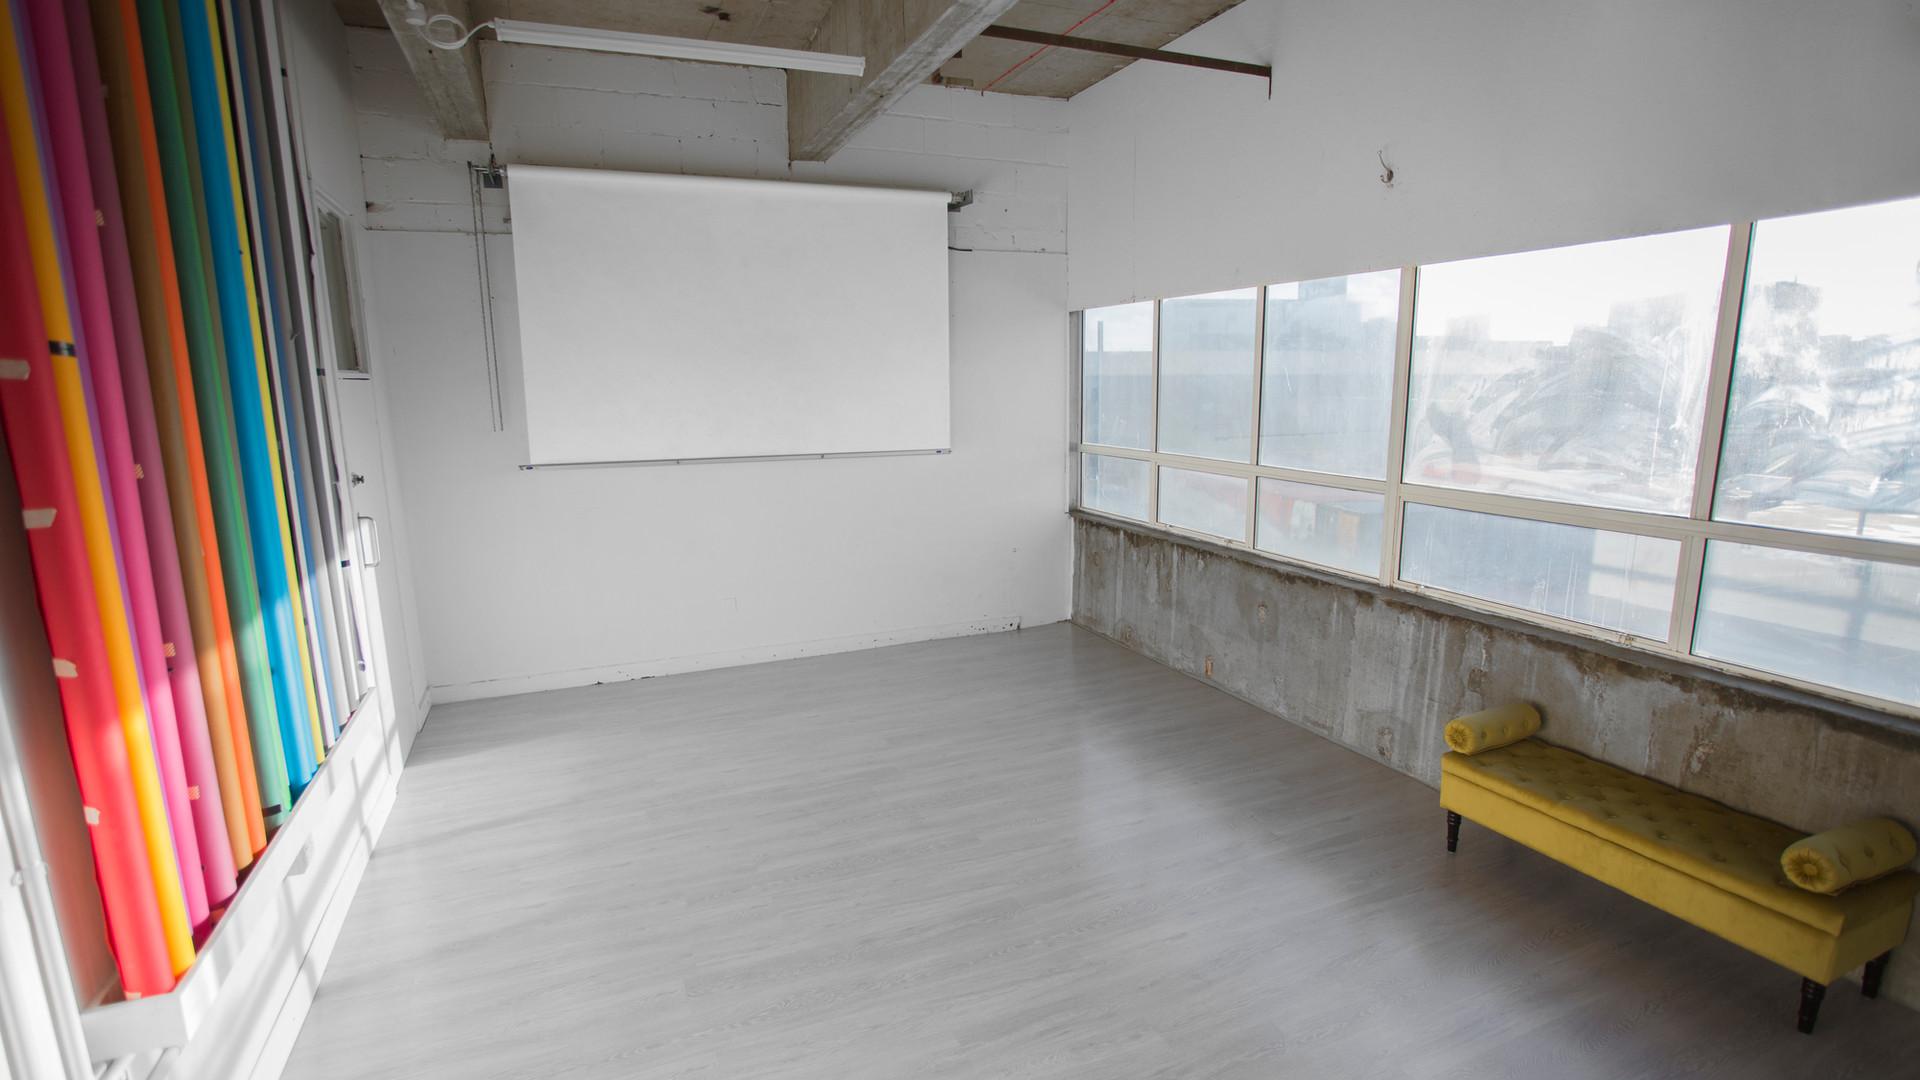 photography-studio-hire-daylight-silverspace-studios-2